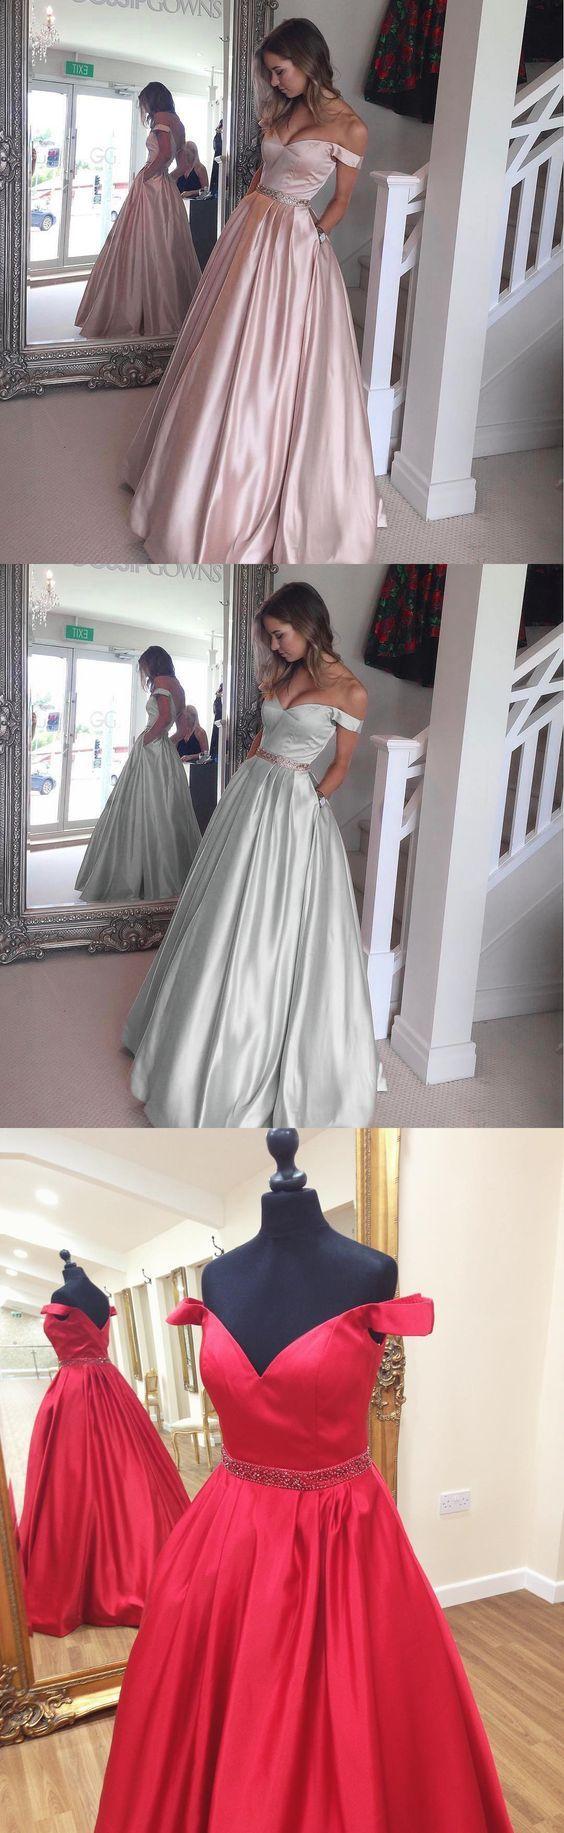 814c46b5a9860fa99ef18adc52e16d46 elegant prom dresses a line prom dresses  small 43aff3b0a